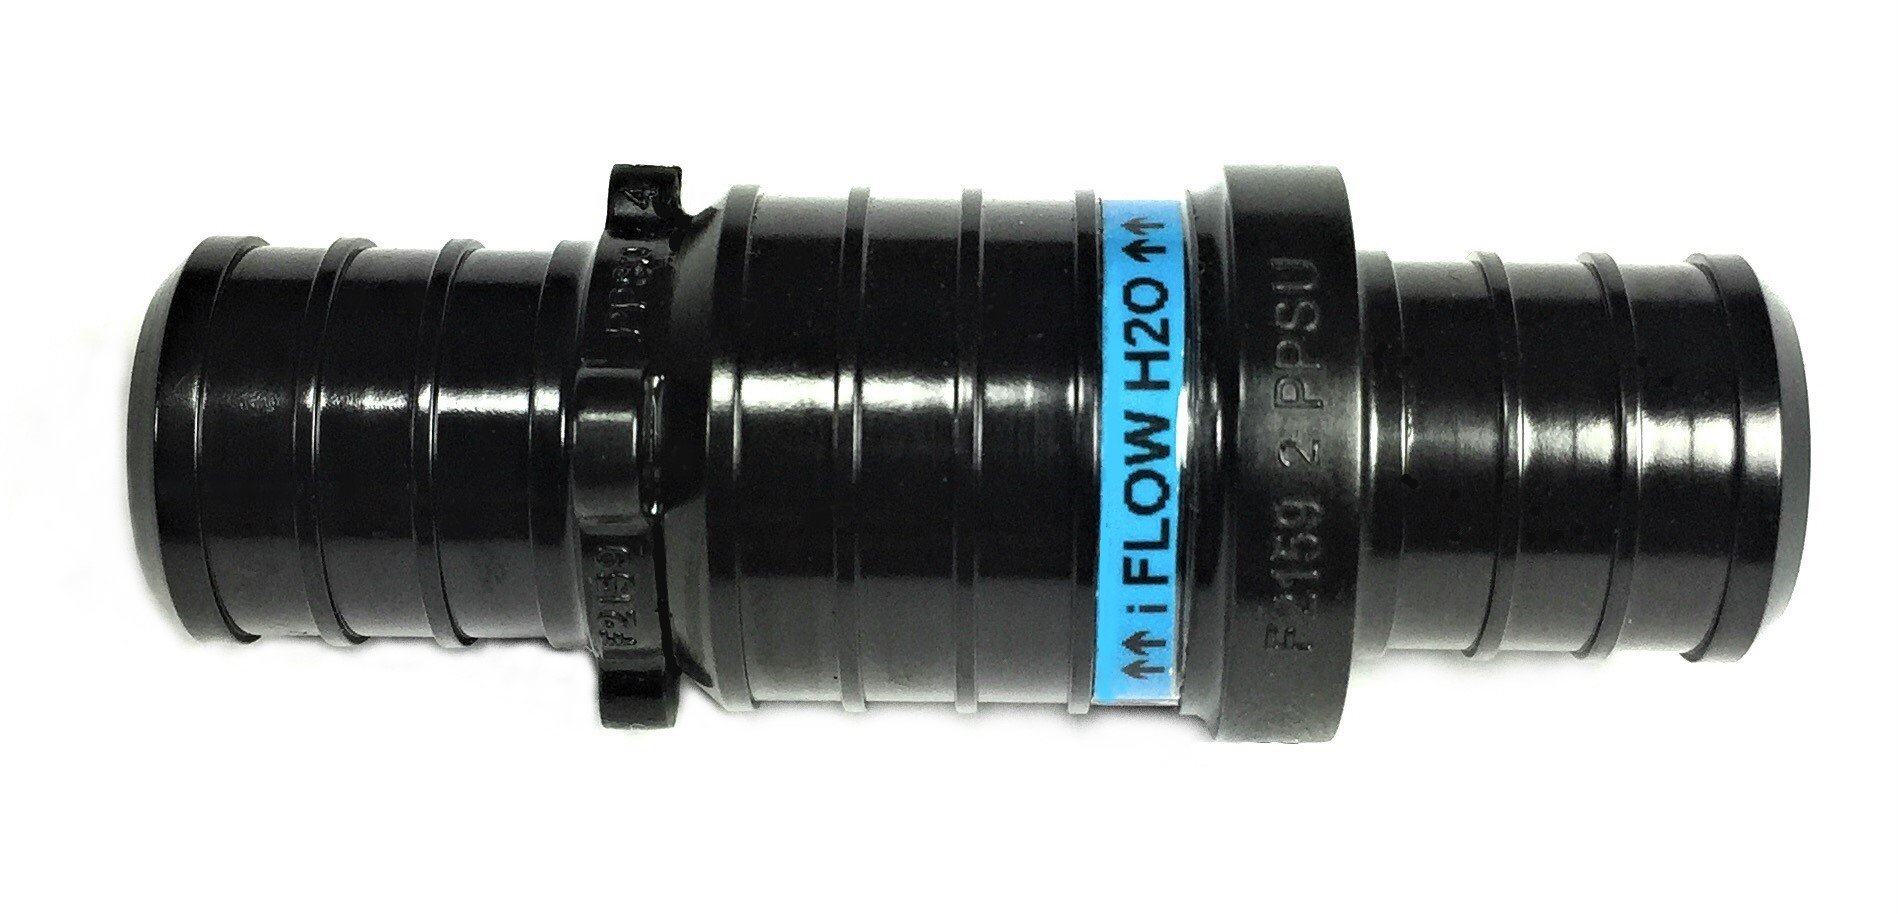 "i Flow H2O Check Valve 3/4""Inch,Barbed Plastic,Pex Tubing,Spa pump,Fish Aquarium Filter Pump,Boat Marine Bilge Pump,Hydroponics Grow,Anti-Back Flow,RV,Hydronic Heating,Actual Barb Size(OD)-22/32''inch by i Flow H2O (Image #1)"